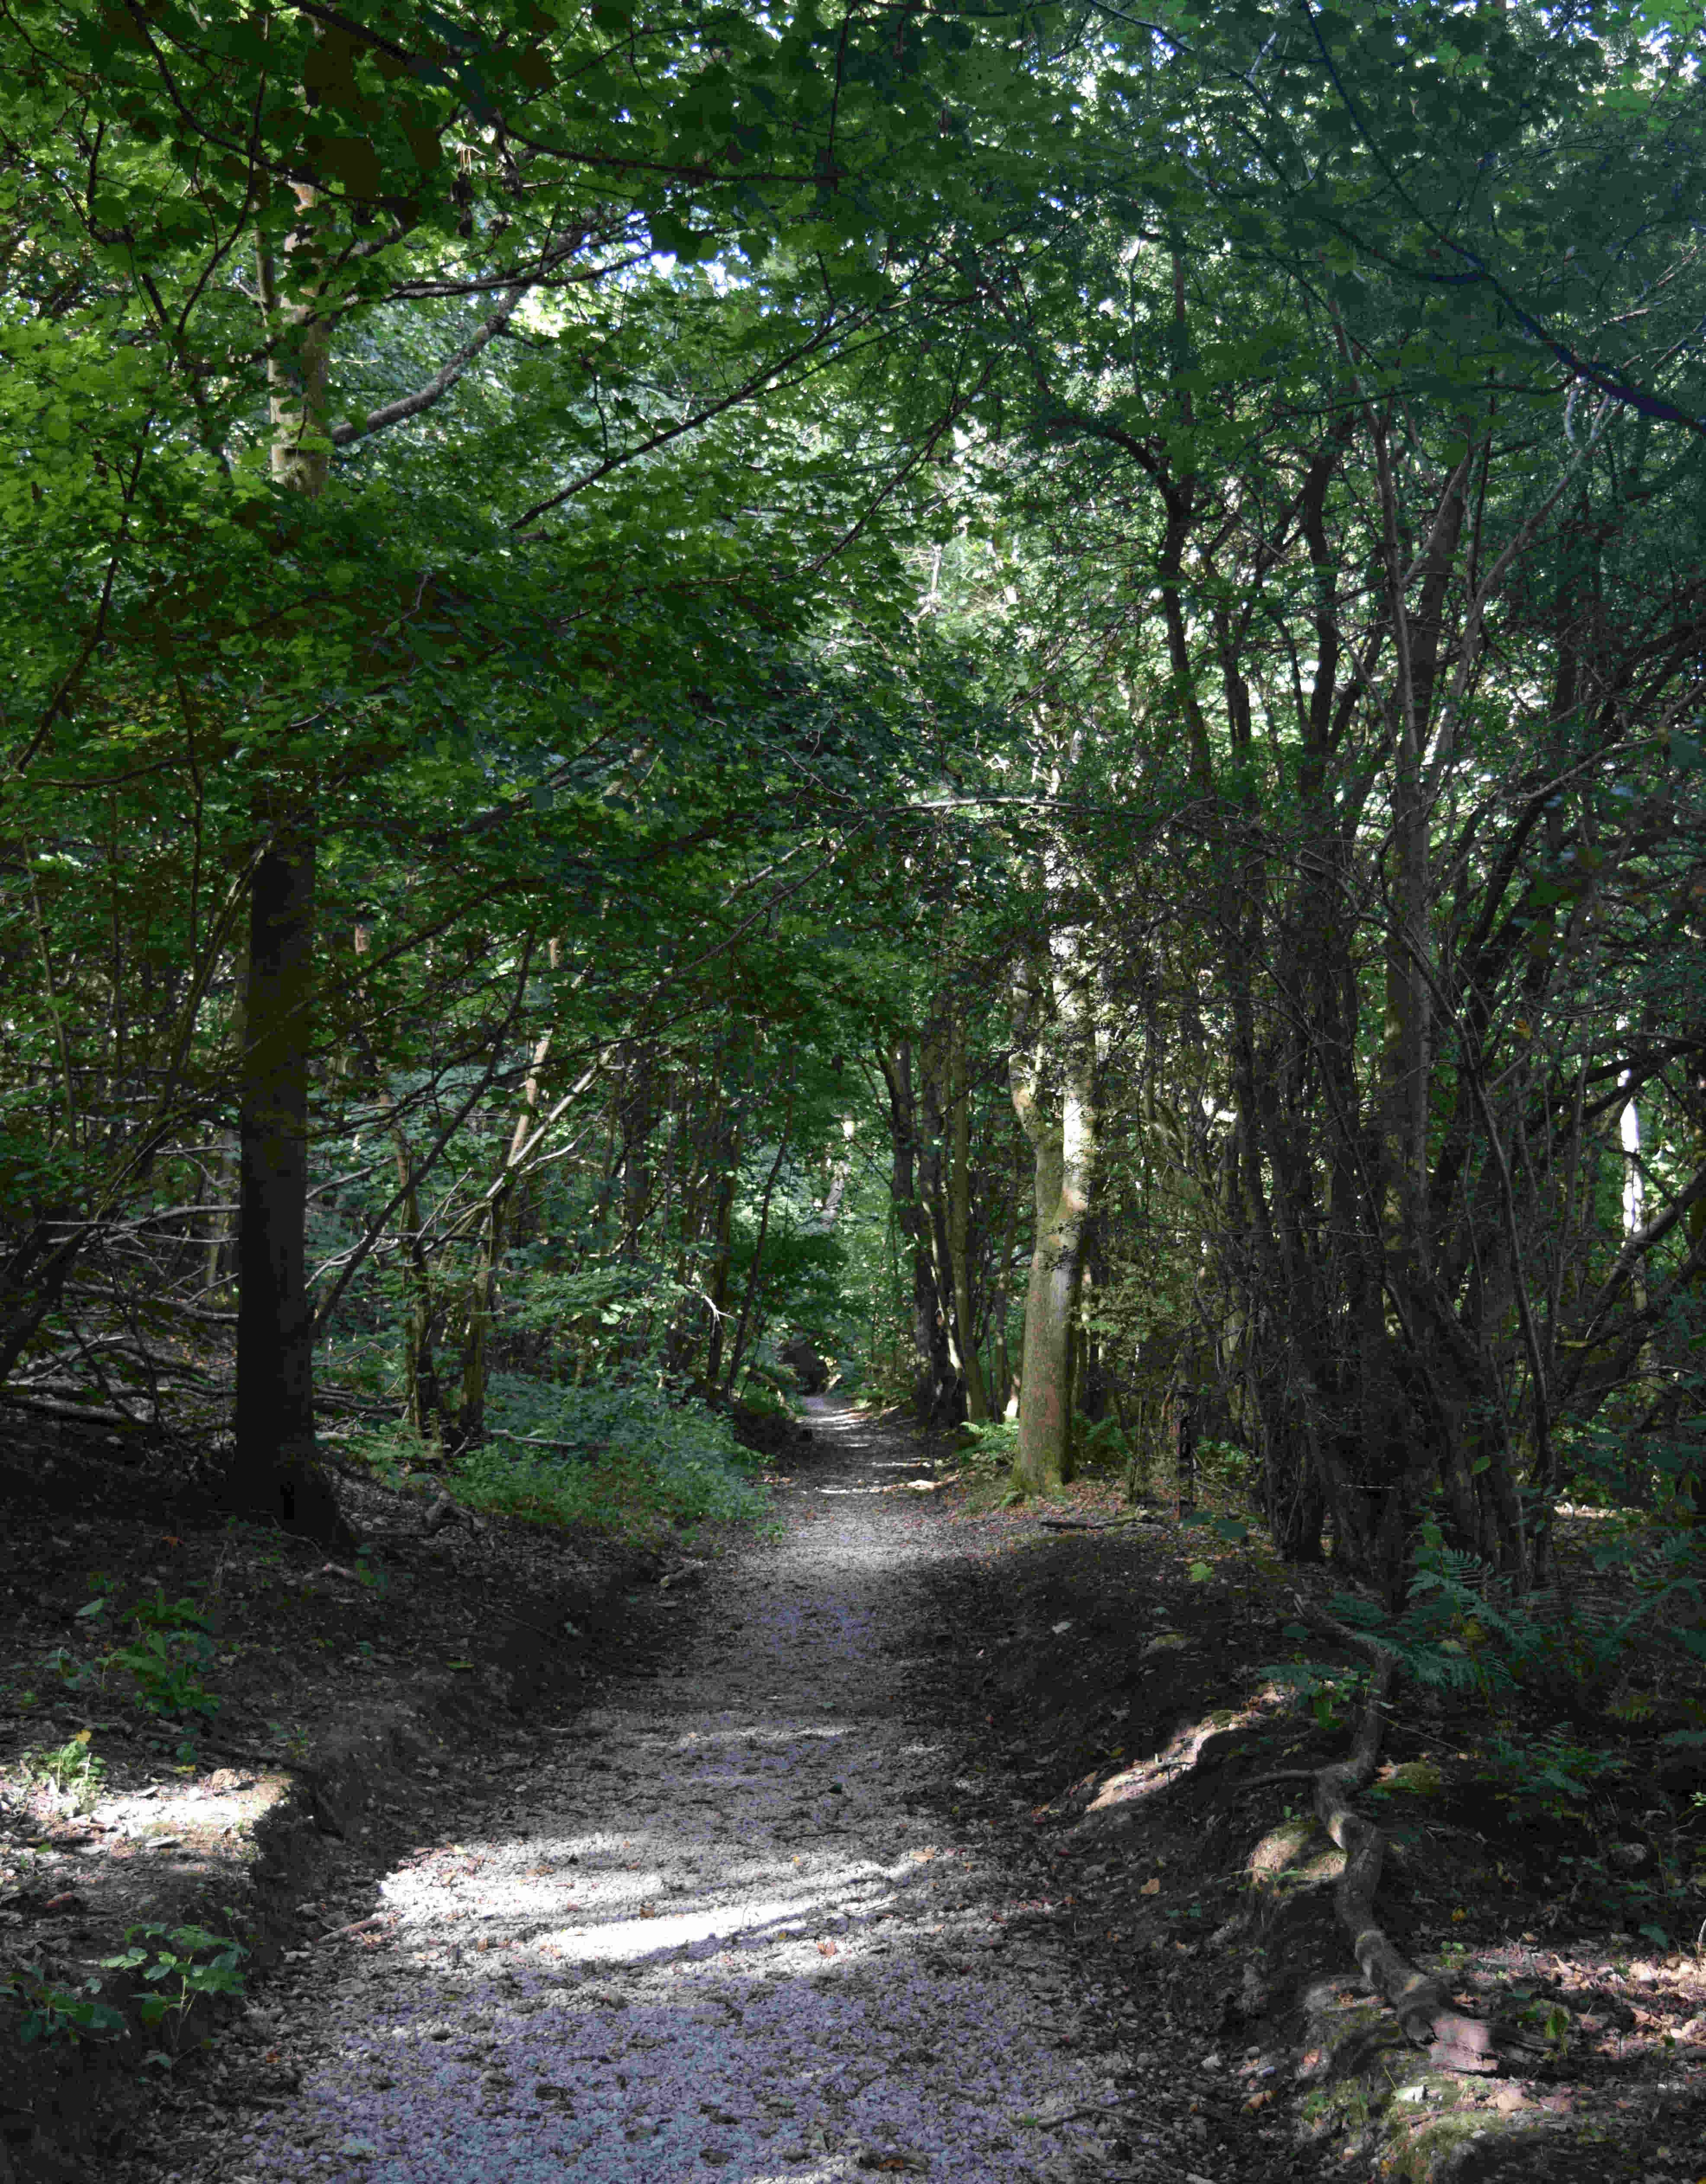 Shorncliffe Sandy Lane